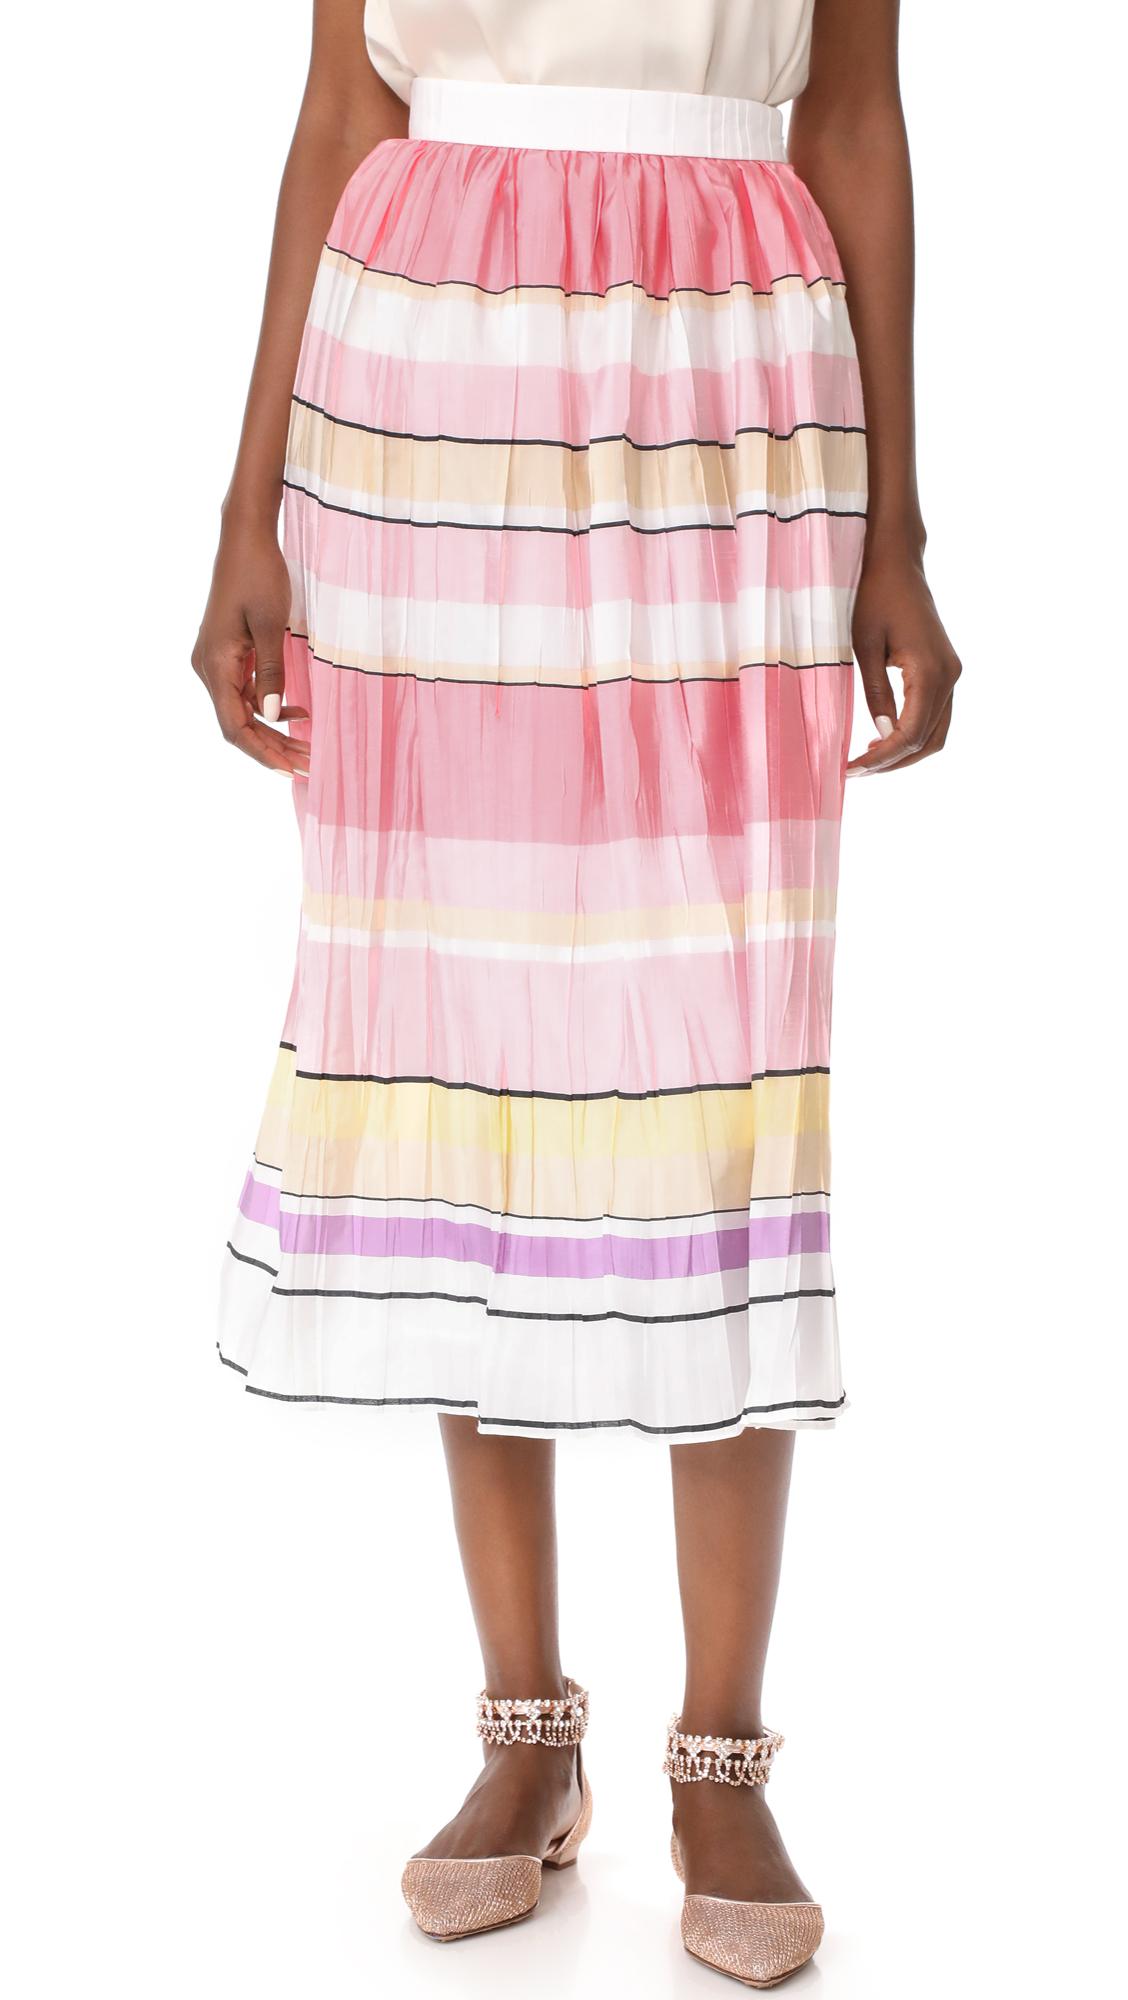 Monique Lhuillier Stripe Midi Skirt - Multi